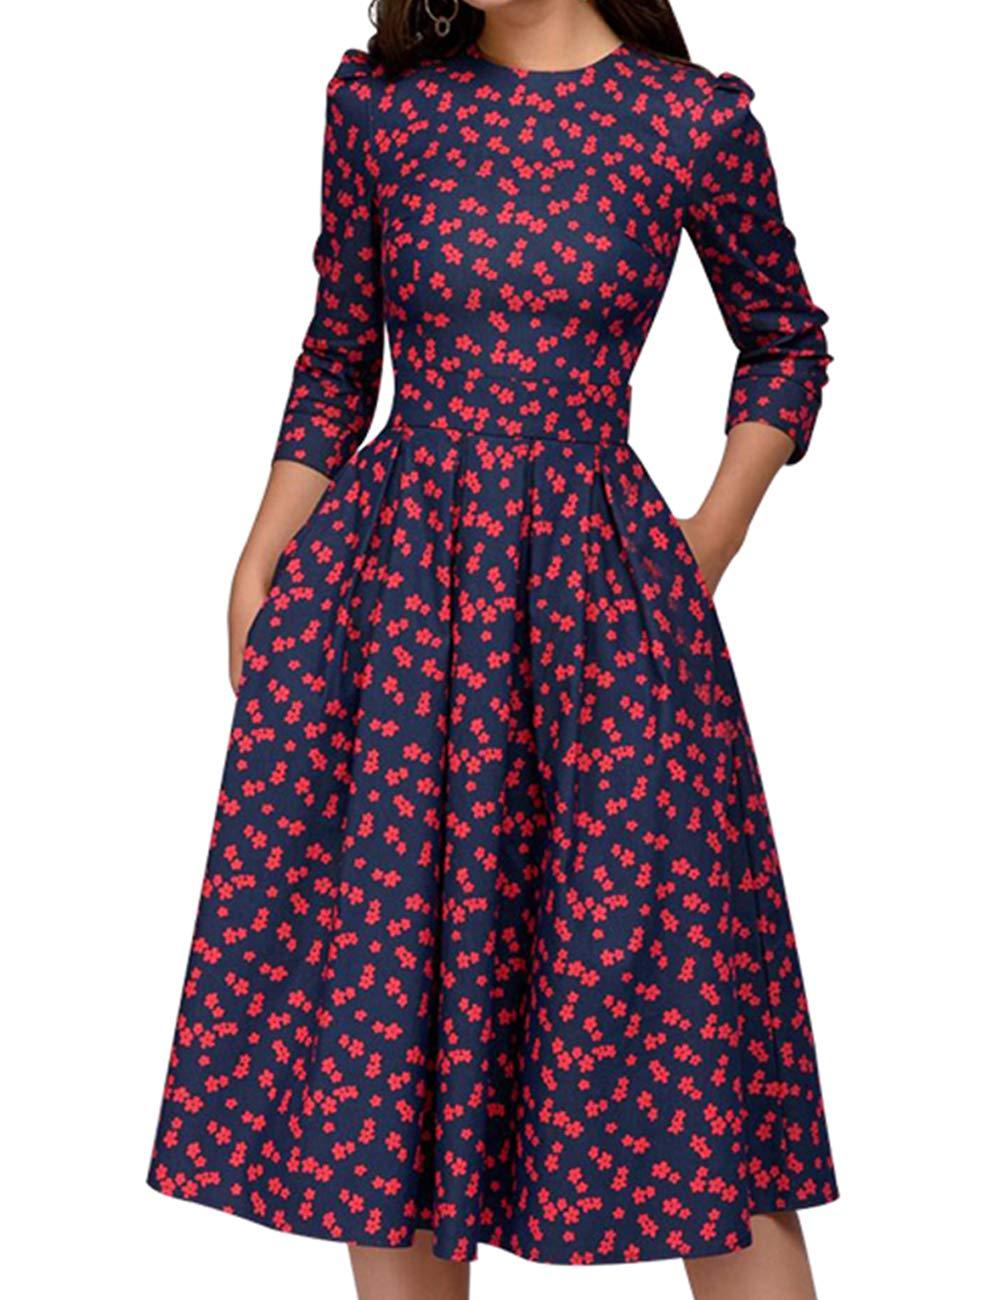 Simple Flavor Women's Floral Vintage Dress Elegant Autumn Midi Evening Dress 3/4 Sleeves (Red,L)